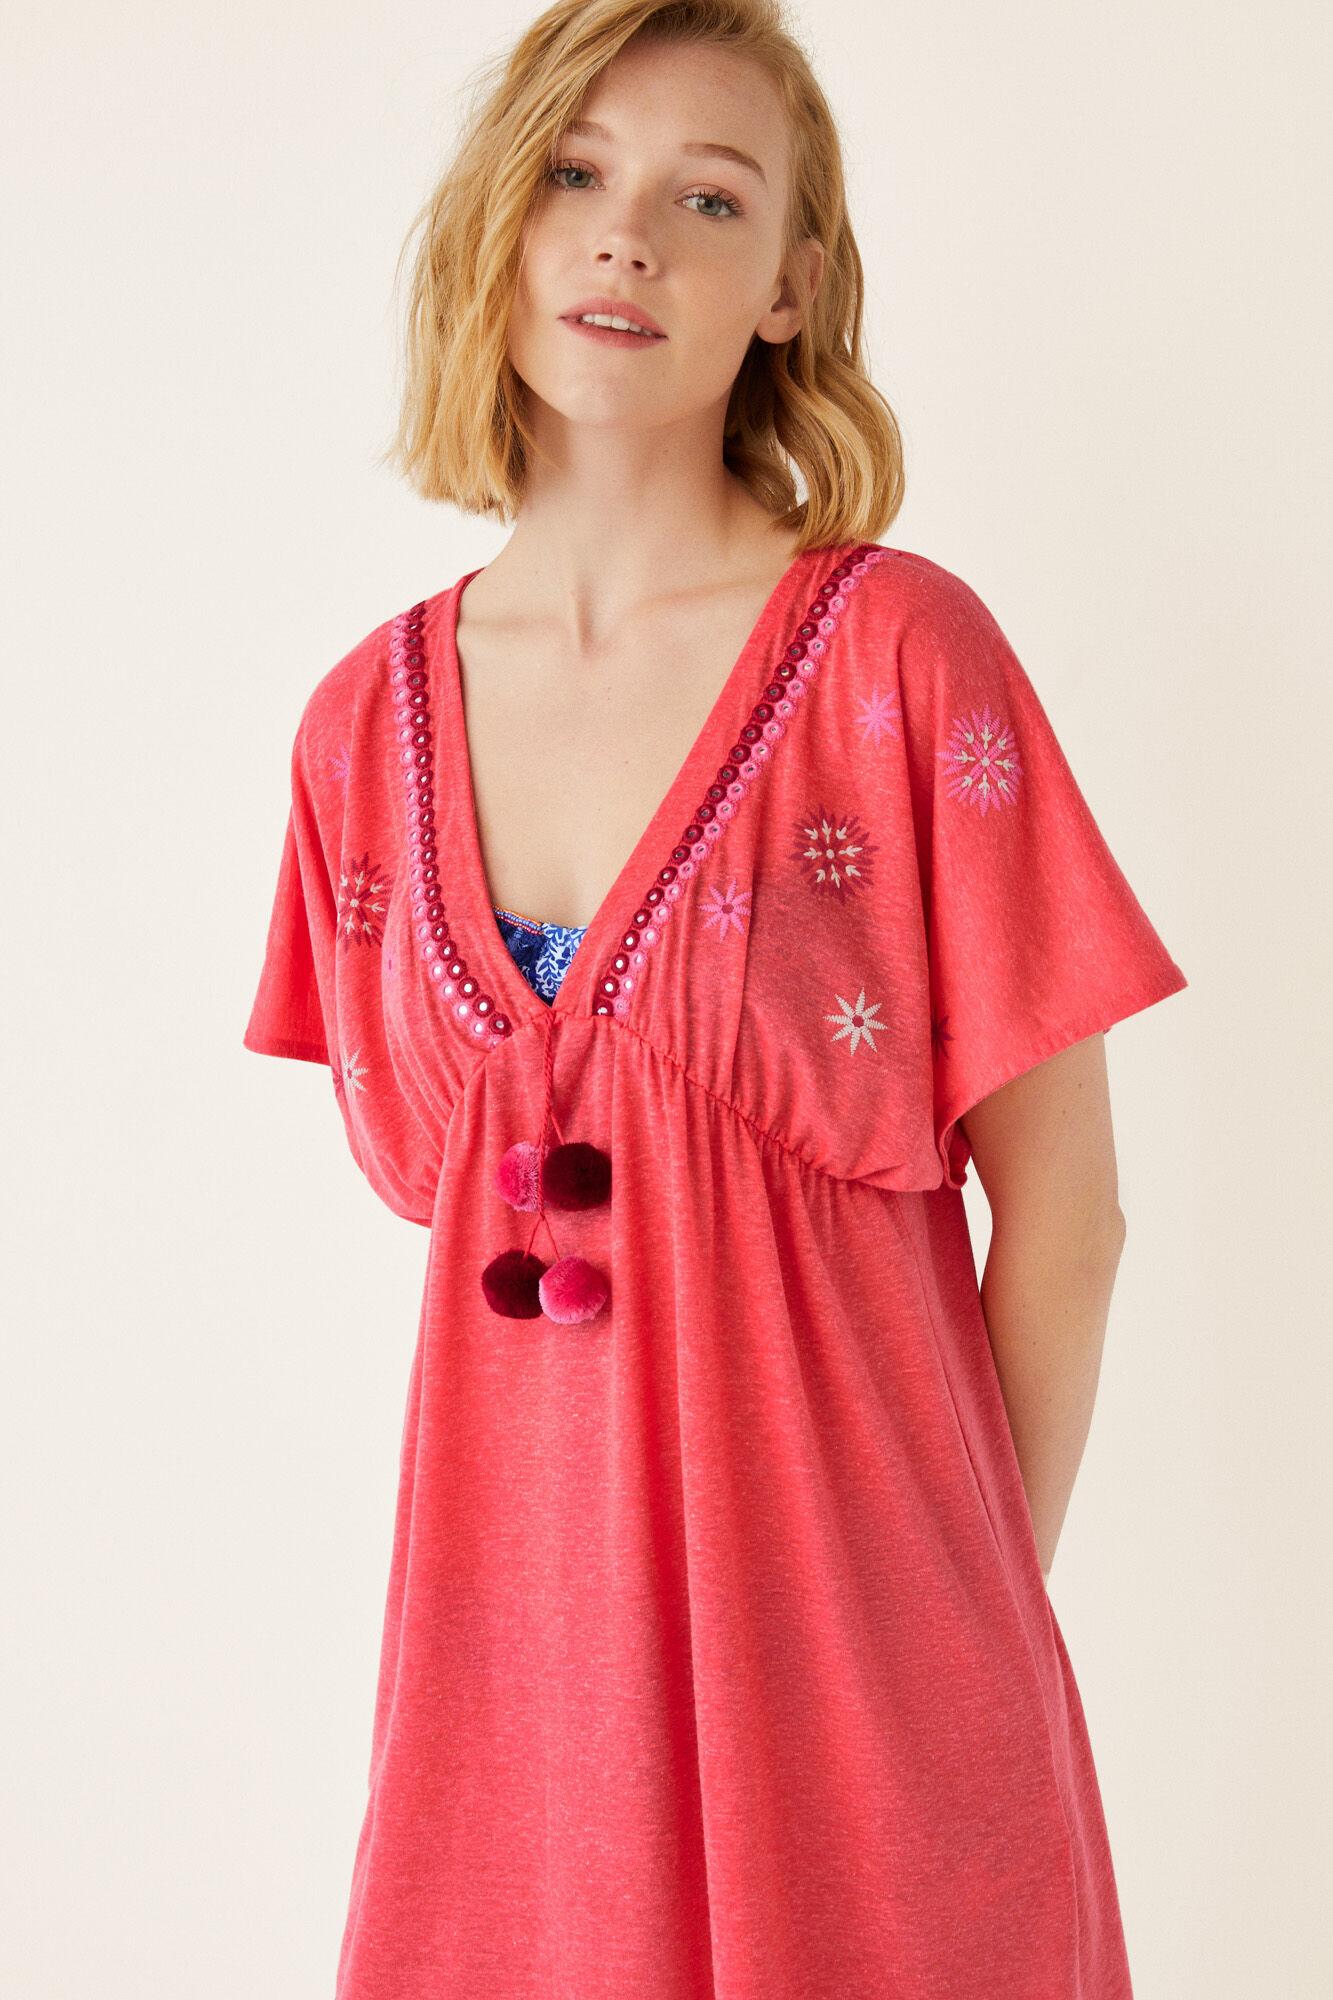 dc6cab4331b Womensecret túnica corta bordados abalorios rosa jpg 600x900 Caftán tunicas  ropa femenina blanco playa